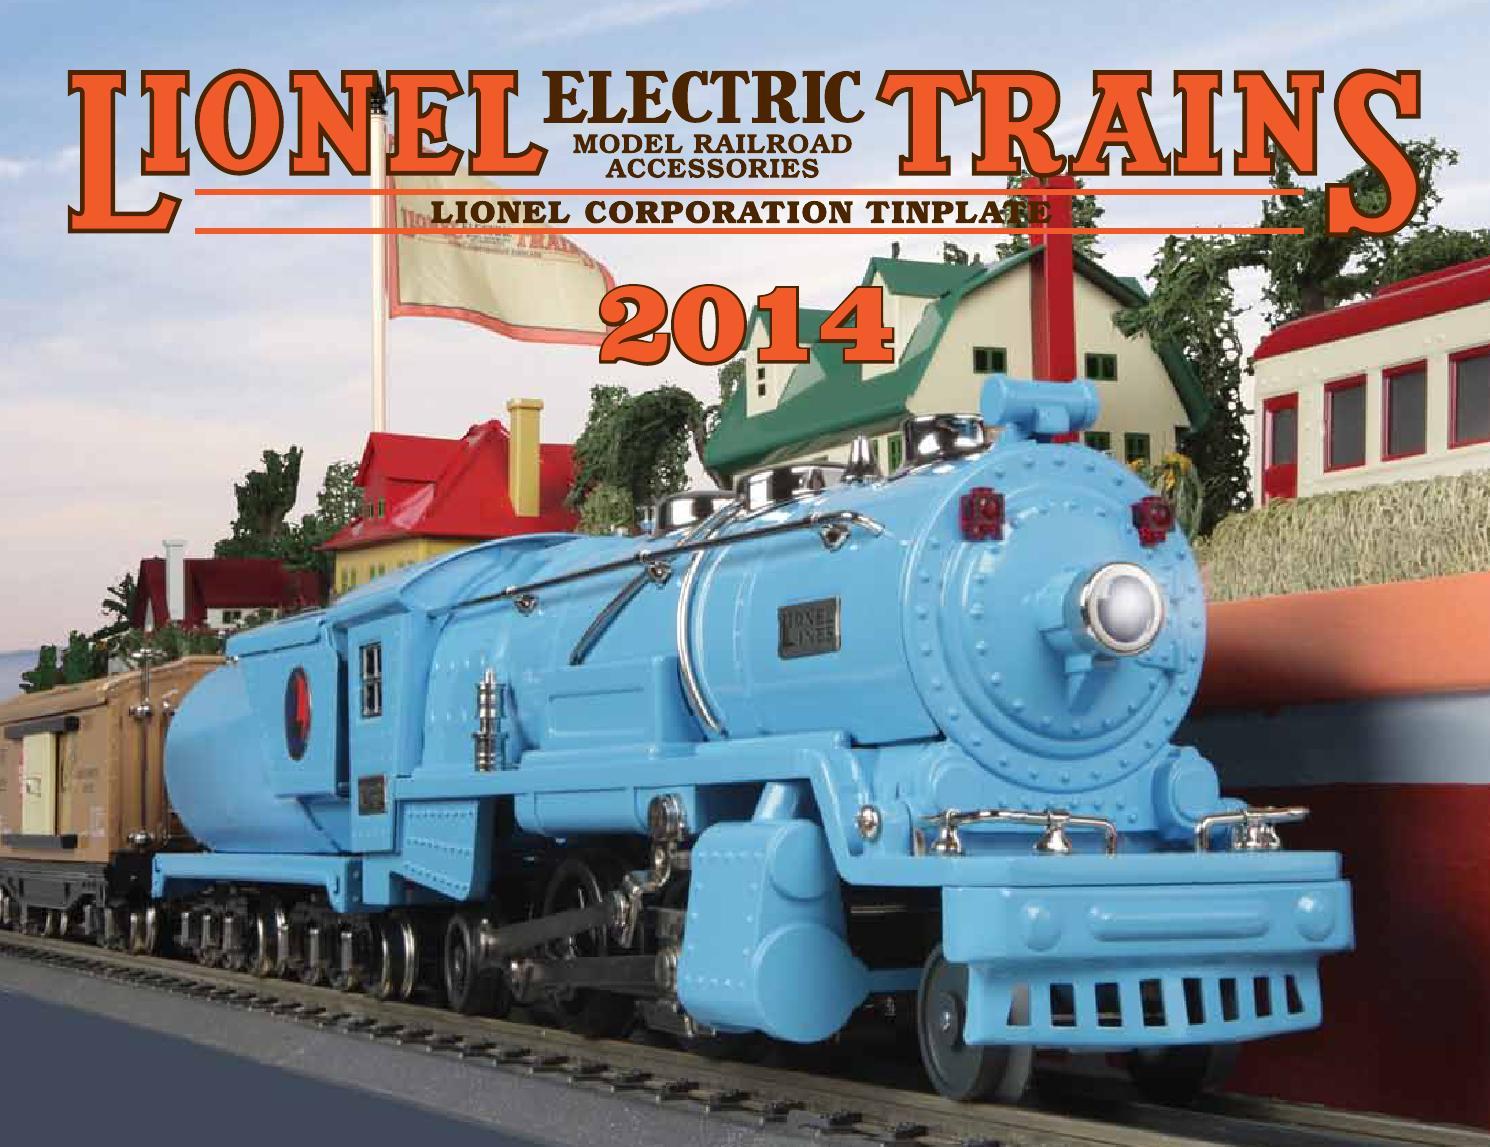 hight resolution of lionel 256 engine exploded diagrams wiring diagram bloglionel 2014 a by modellismoferroviario it issuu lionel train